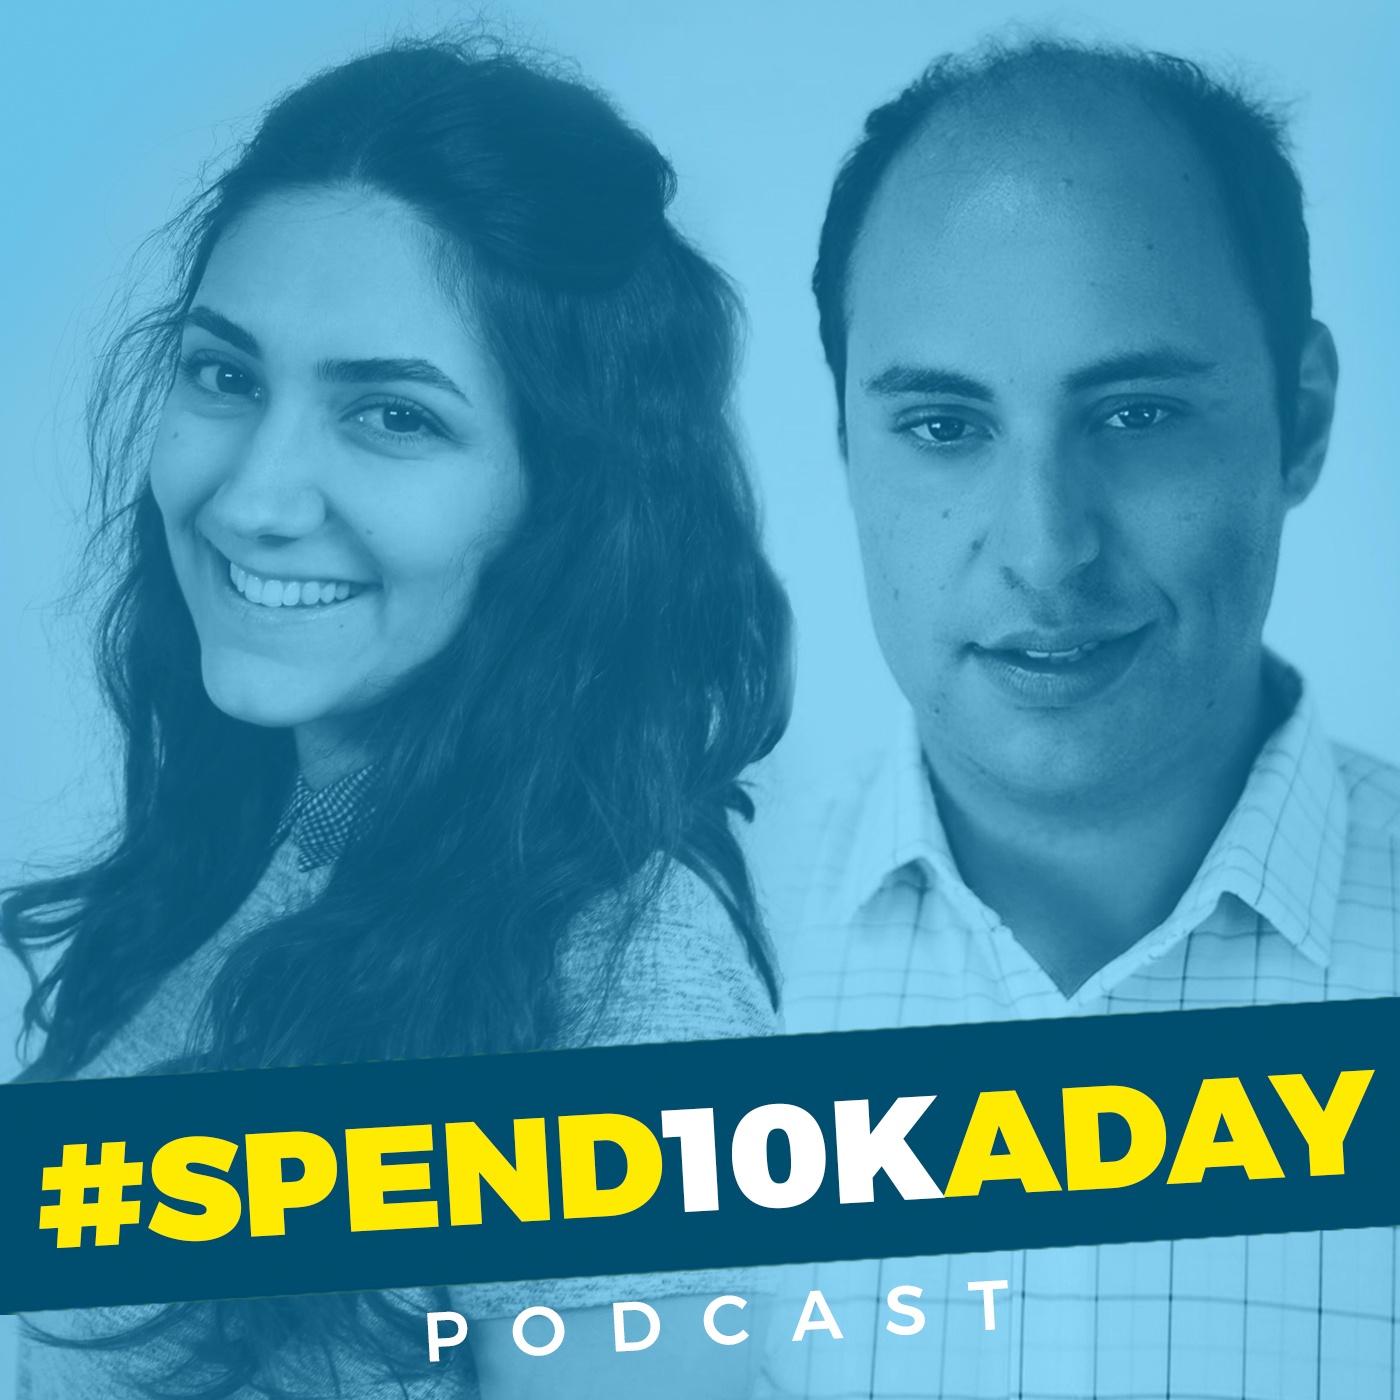 Mutesix Spend 10k a Day Hosts